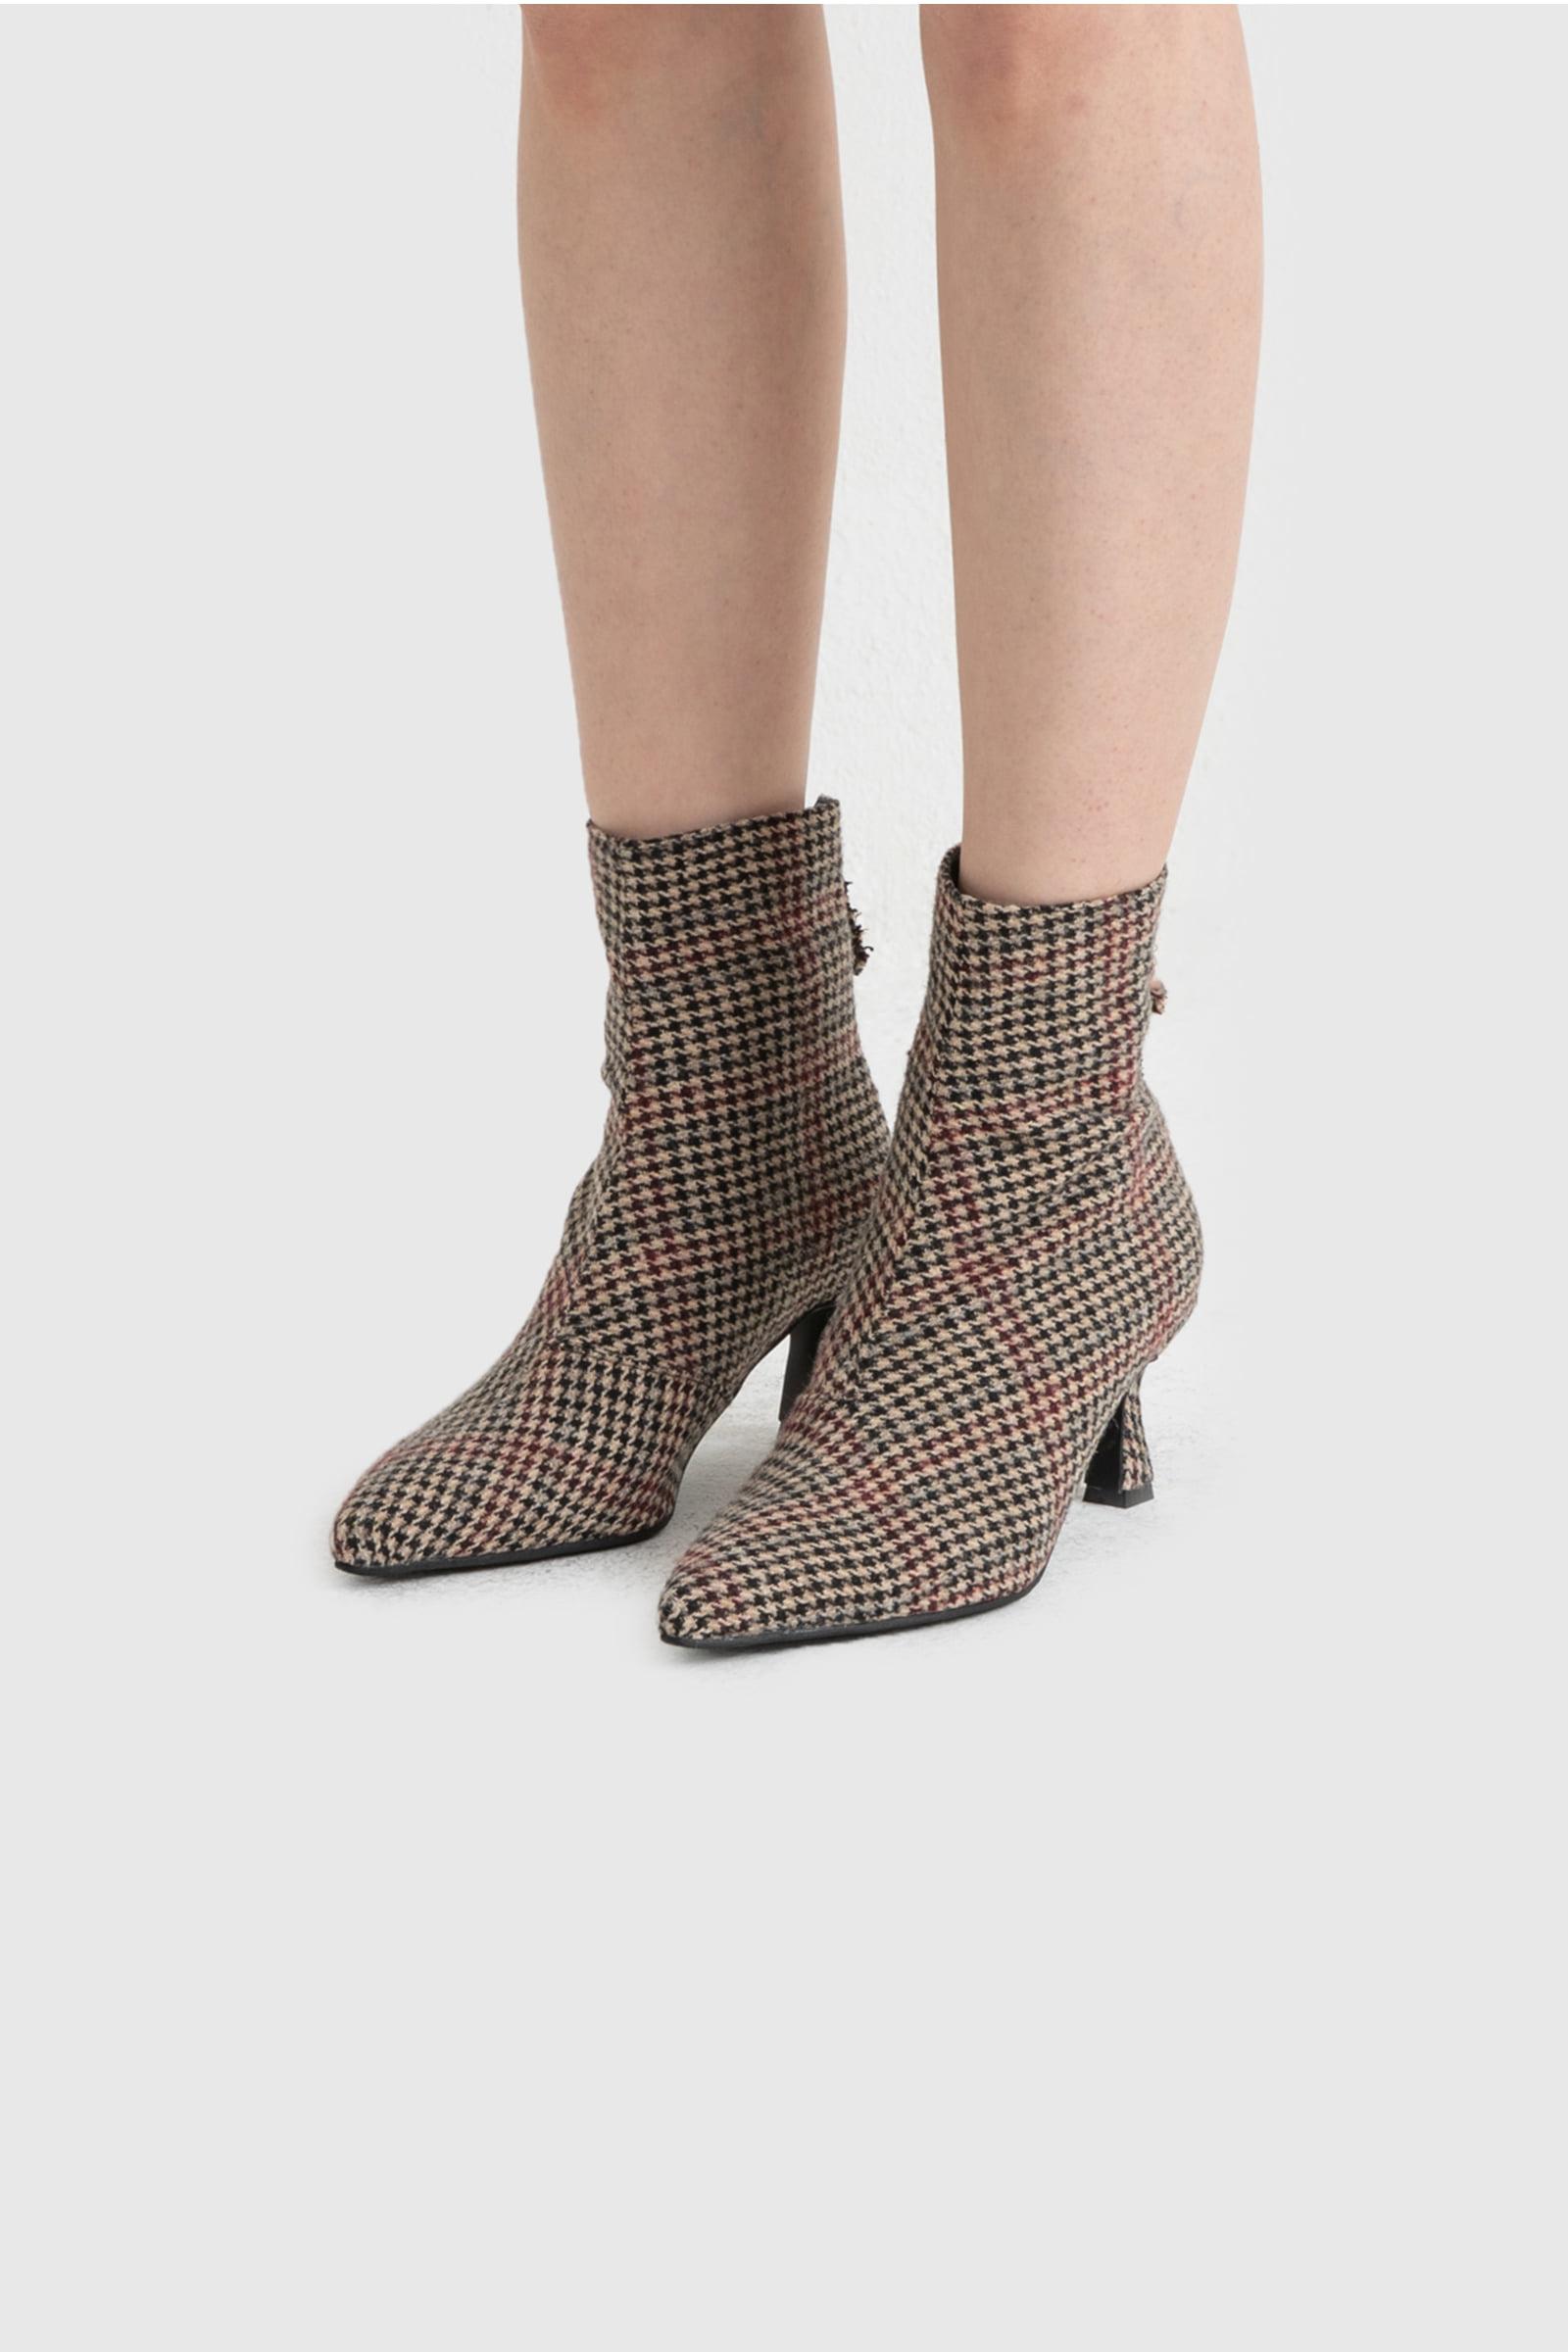 Velita high heel ankle boots